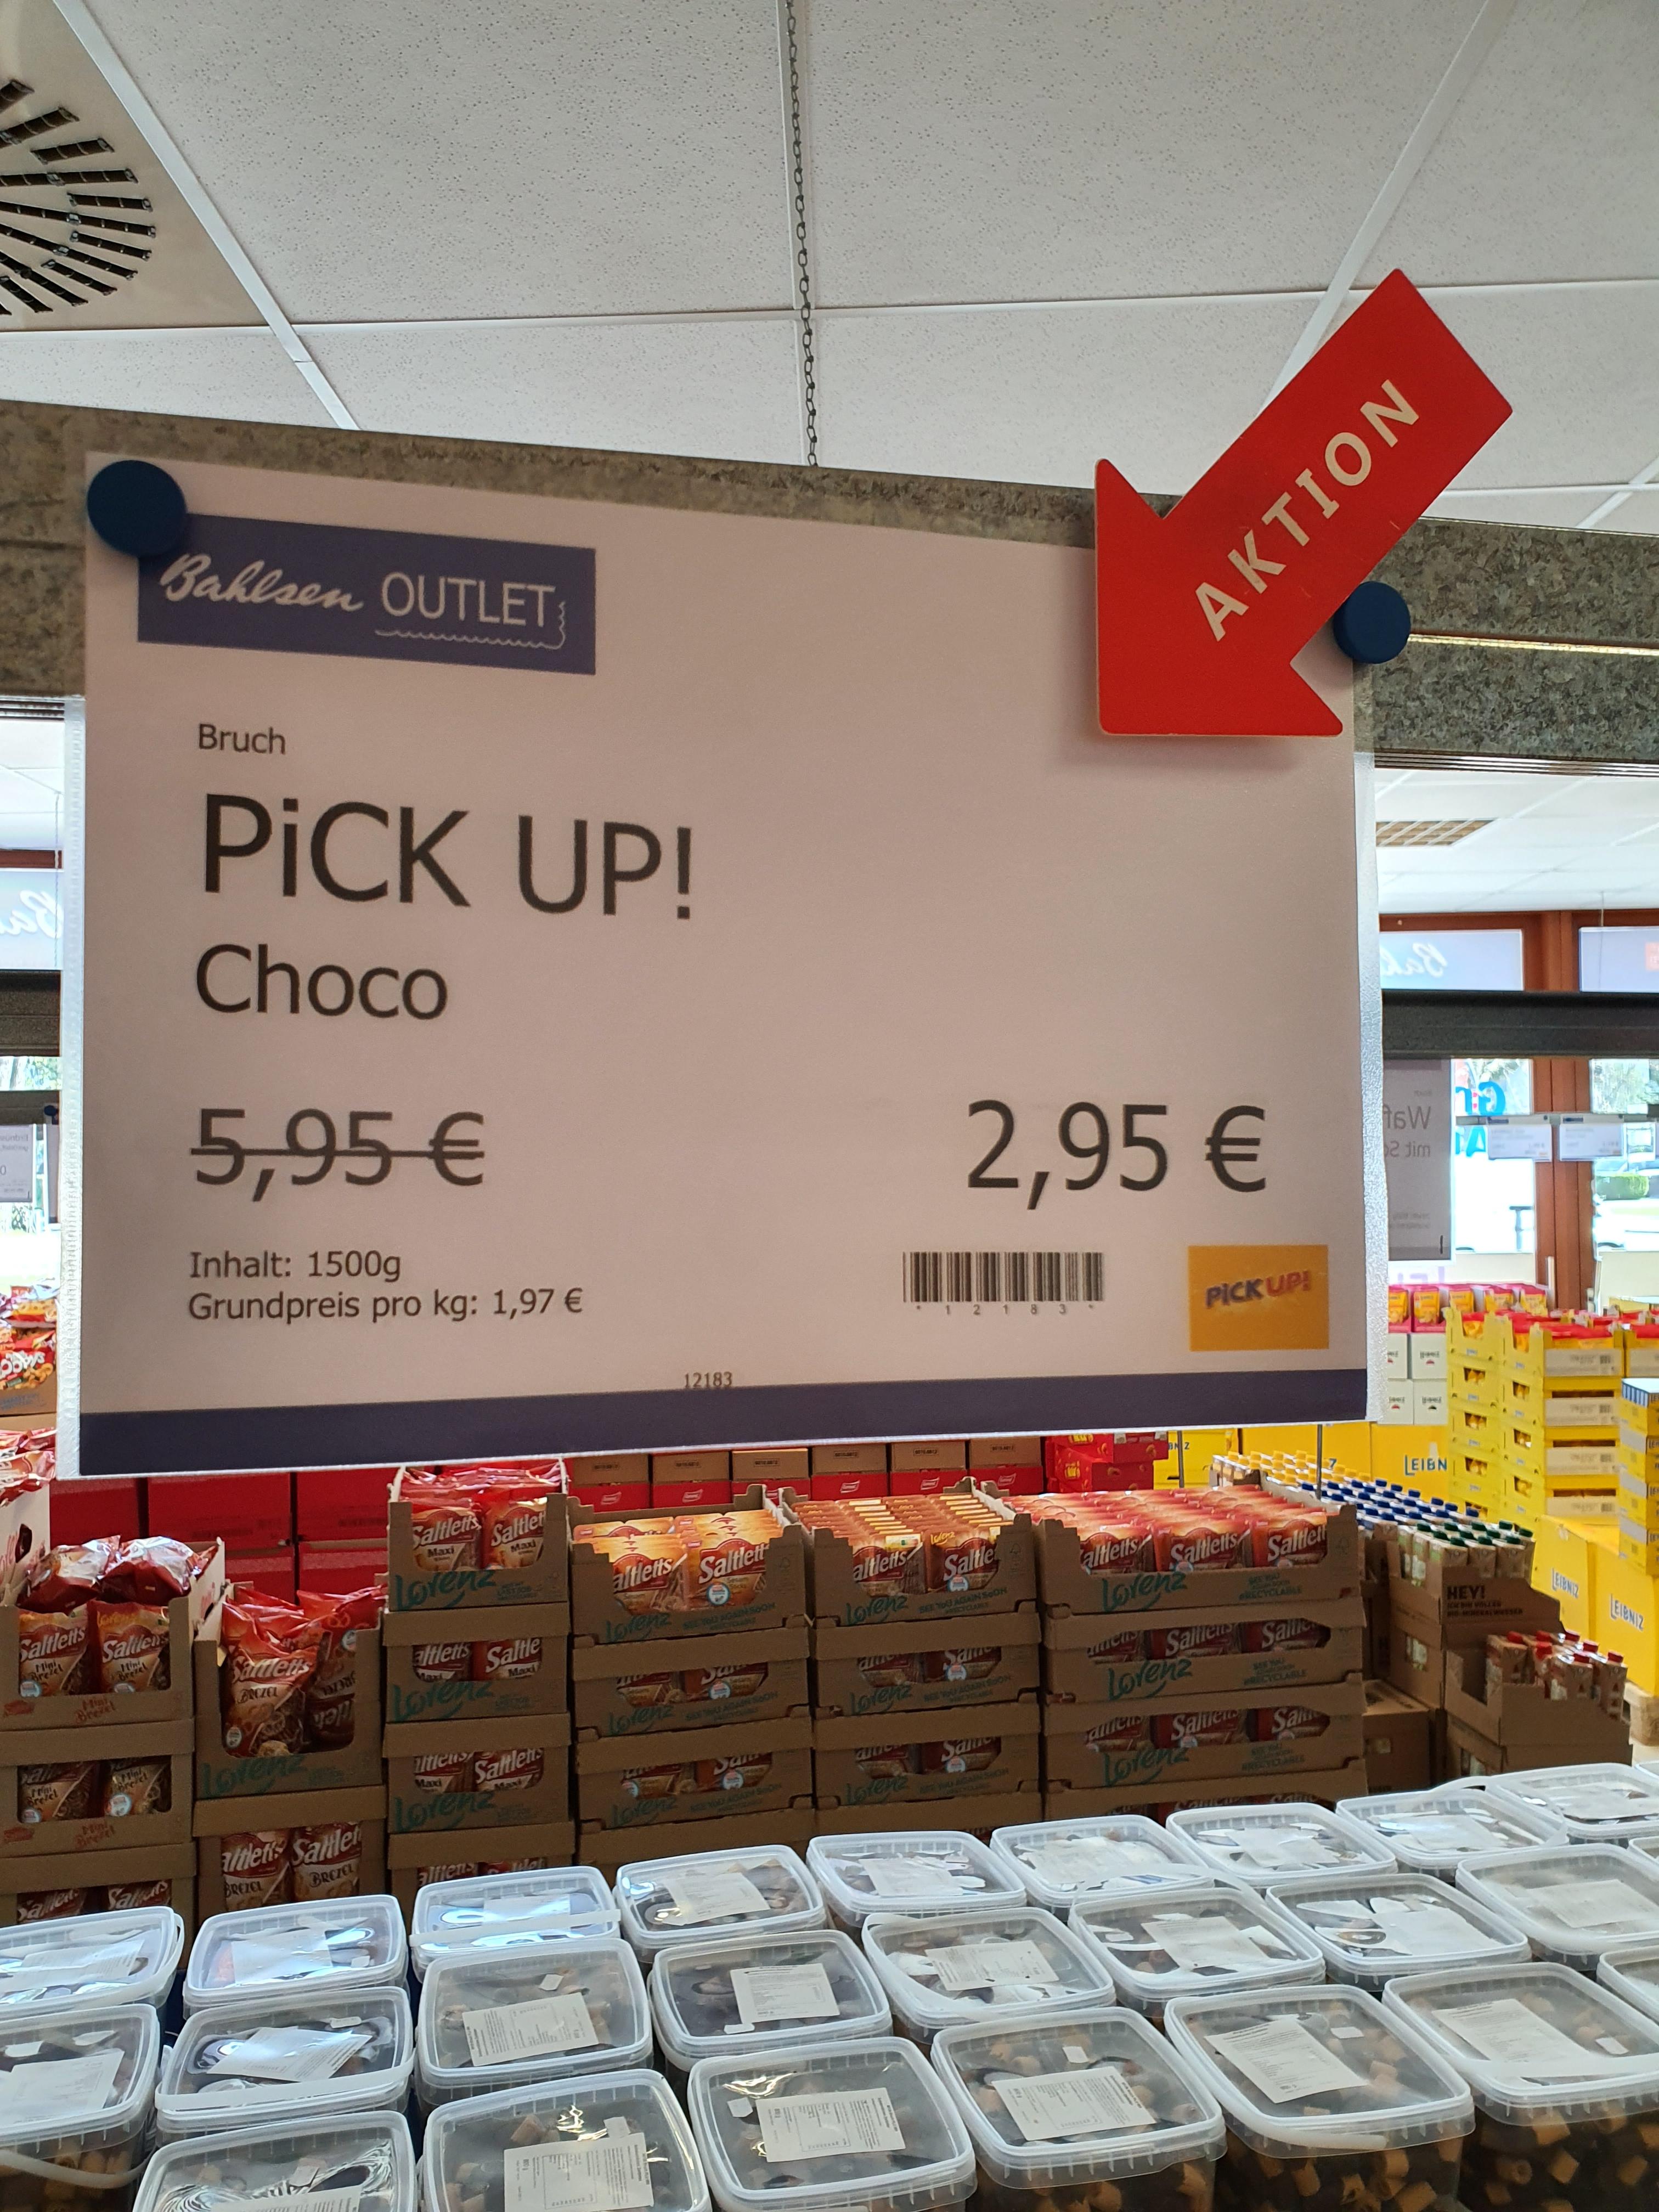 [ LOKAL - Hamburg West ] [ Bahlsen Outlet ] Sammeldeal - z.B. PiCK UP! Choco ( Bruch ) 1,5kg = 2,95€ / Messino Dark Temptation = 30 Cent